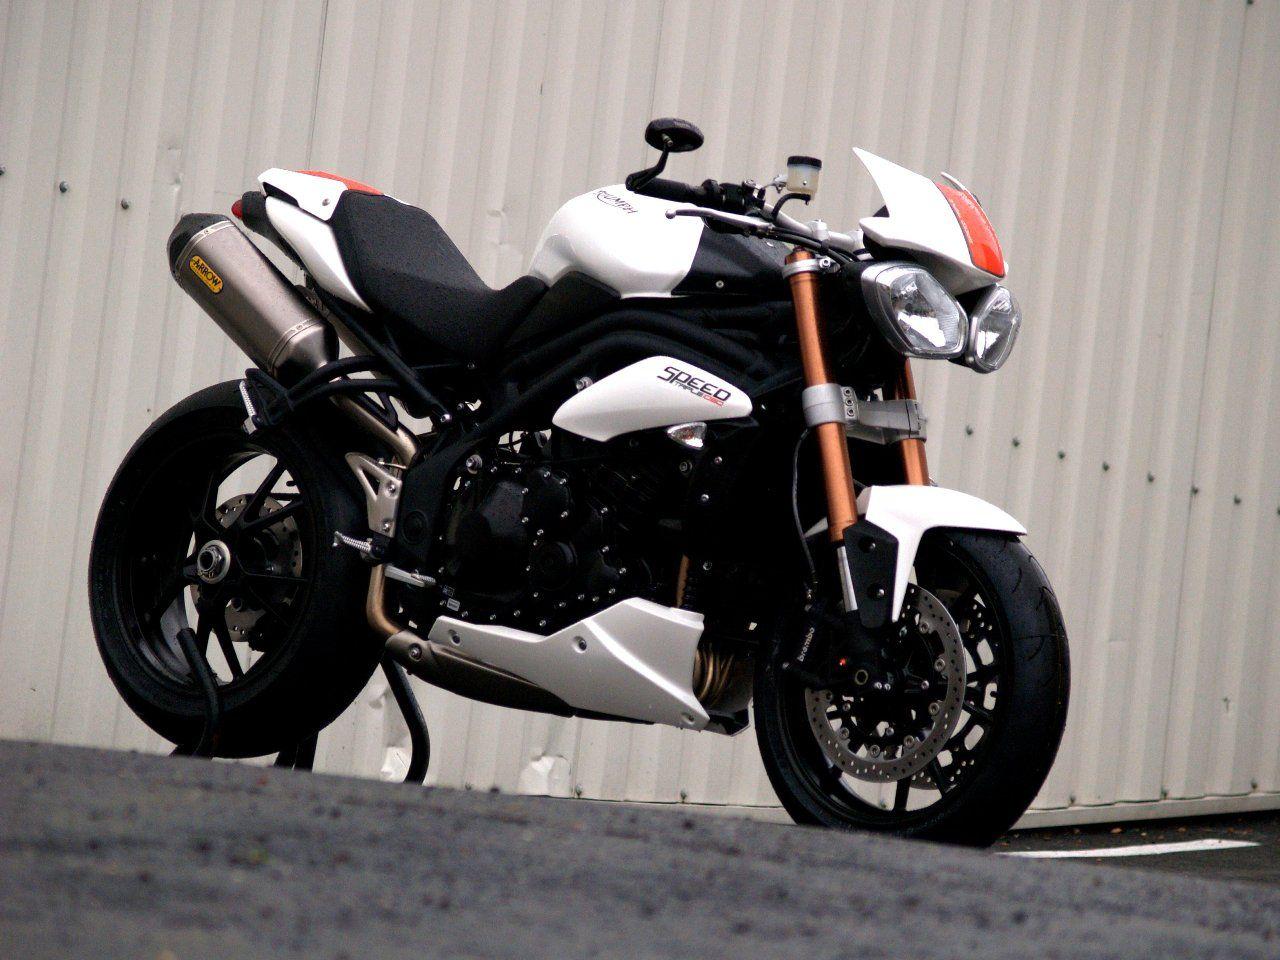 Moto, scooter : equipements et accessoires moto (cross